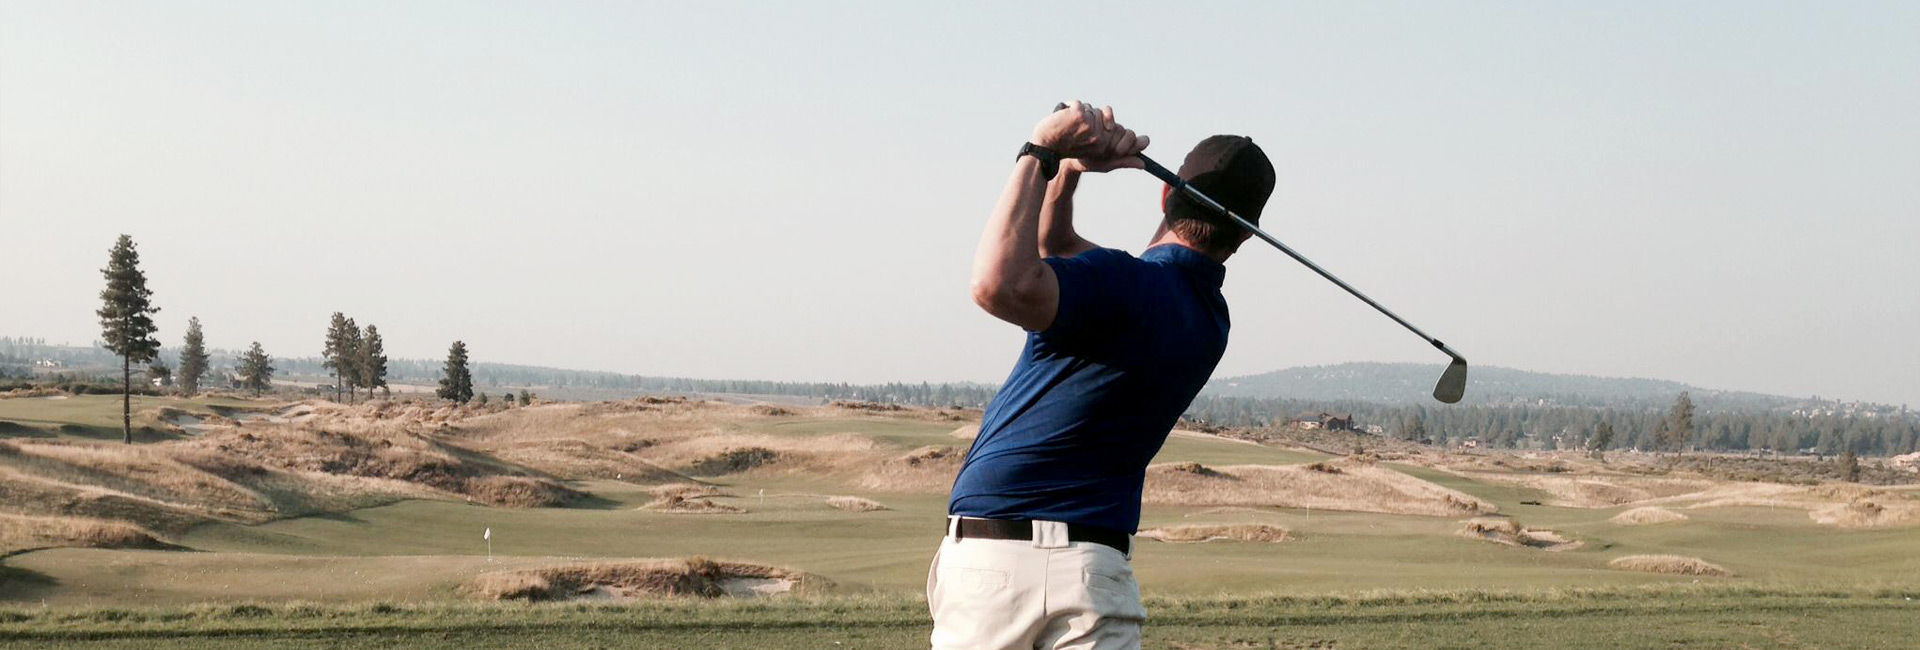 Golf Fitness & Performance Program